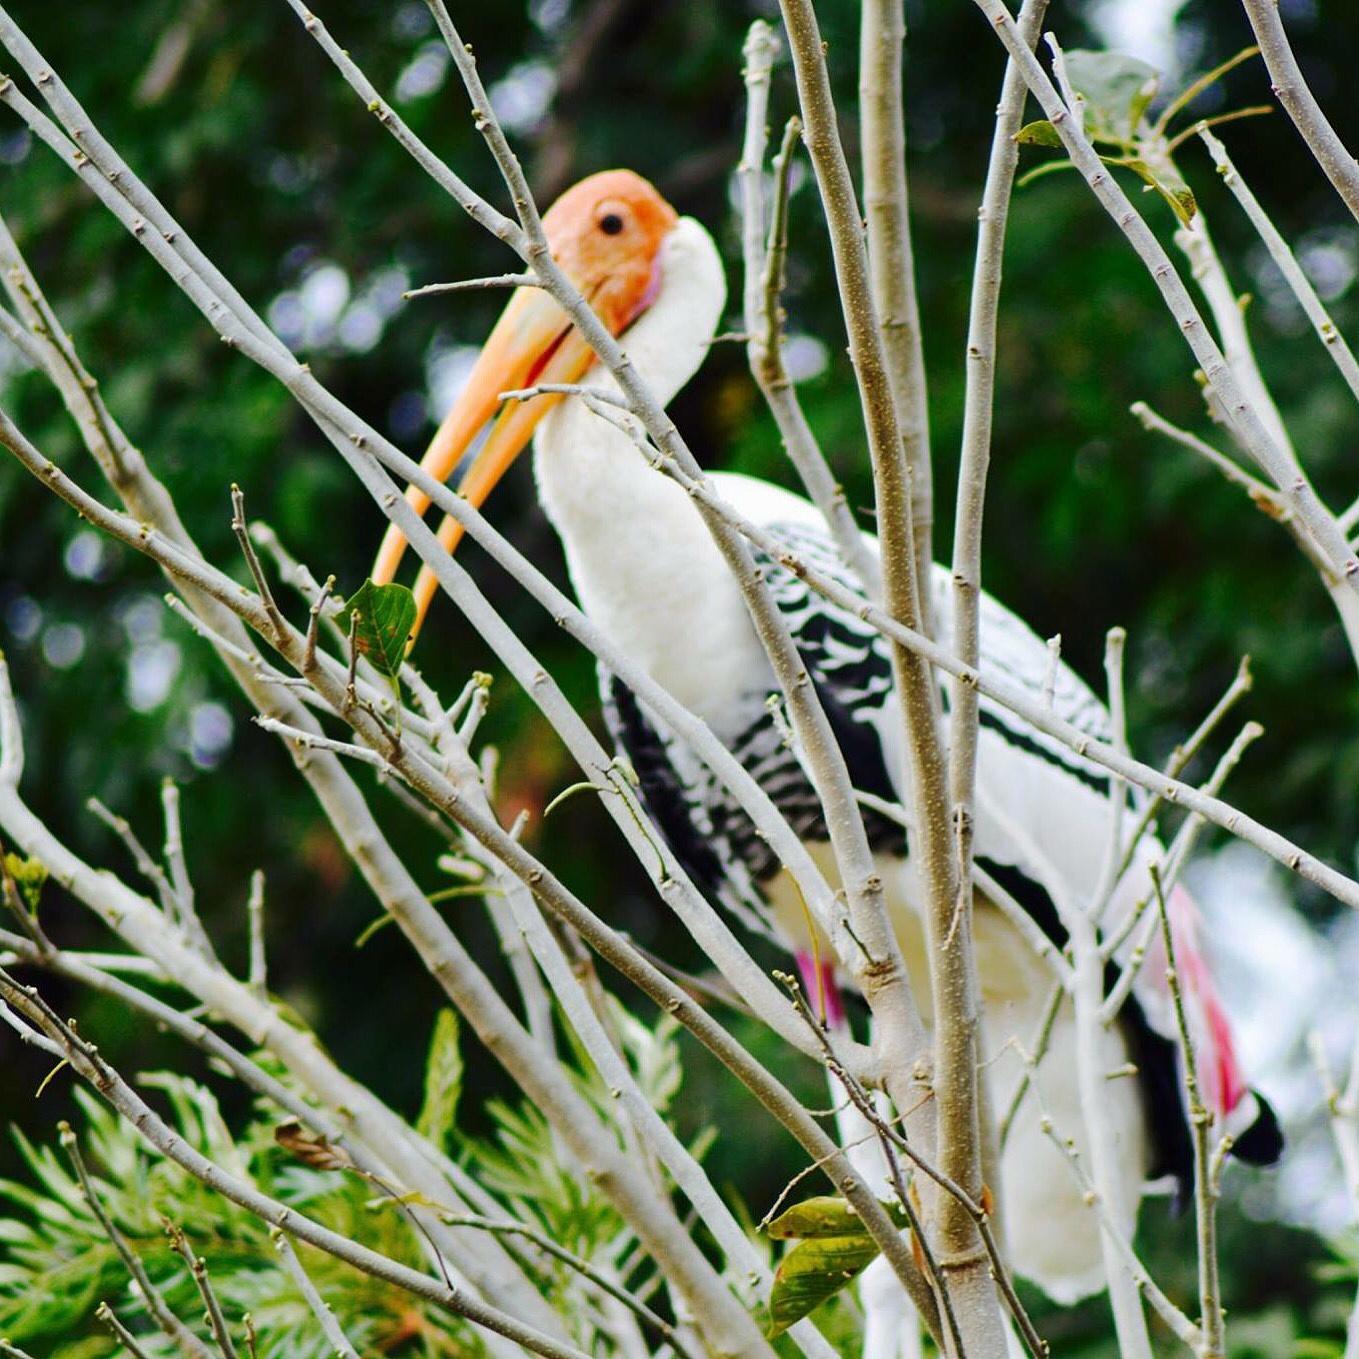 Painted Storks @Veerapuram Bird Sanctuary #storks #birdsanctuary #nature by chetaninamdar